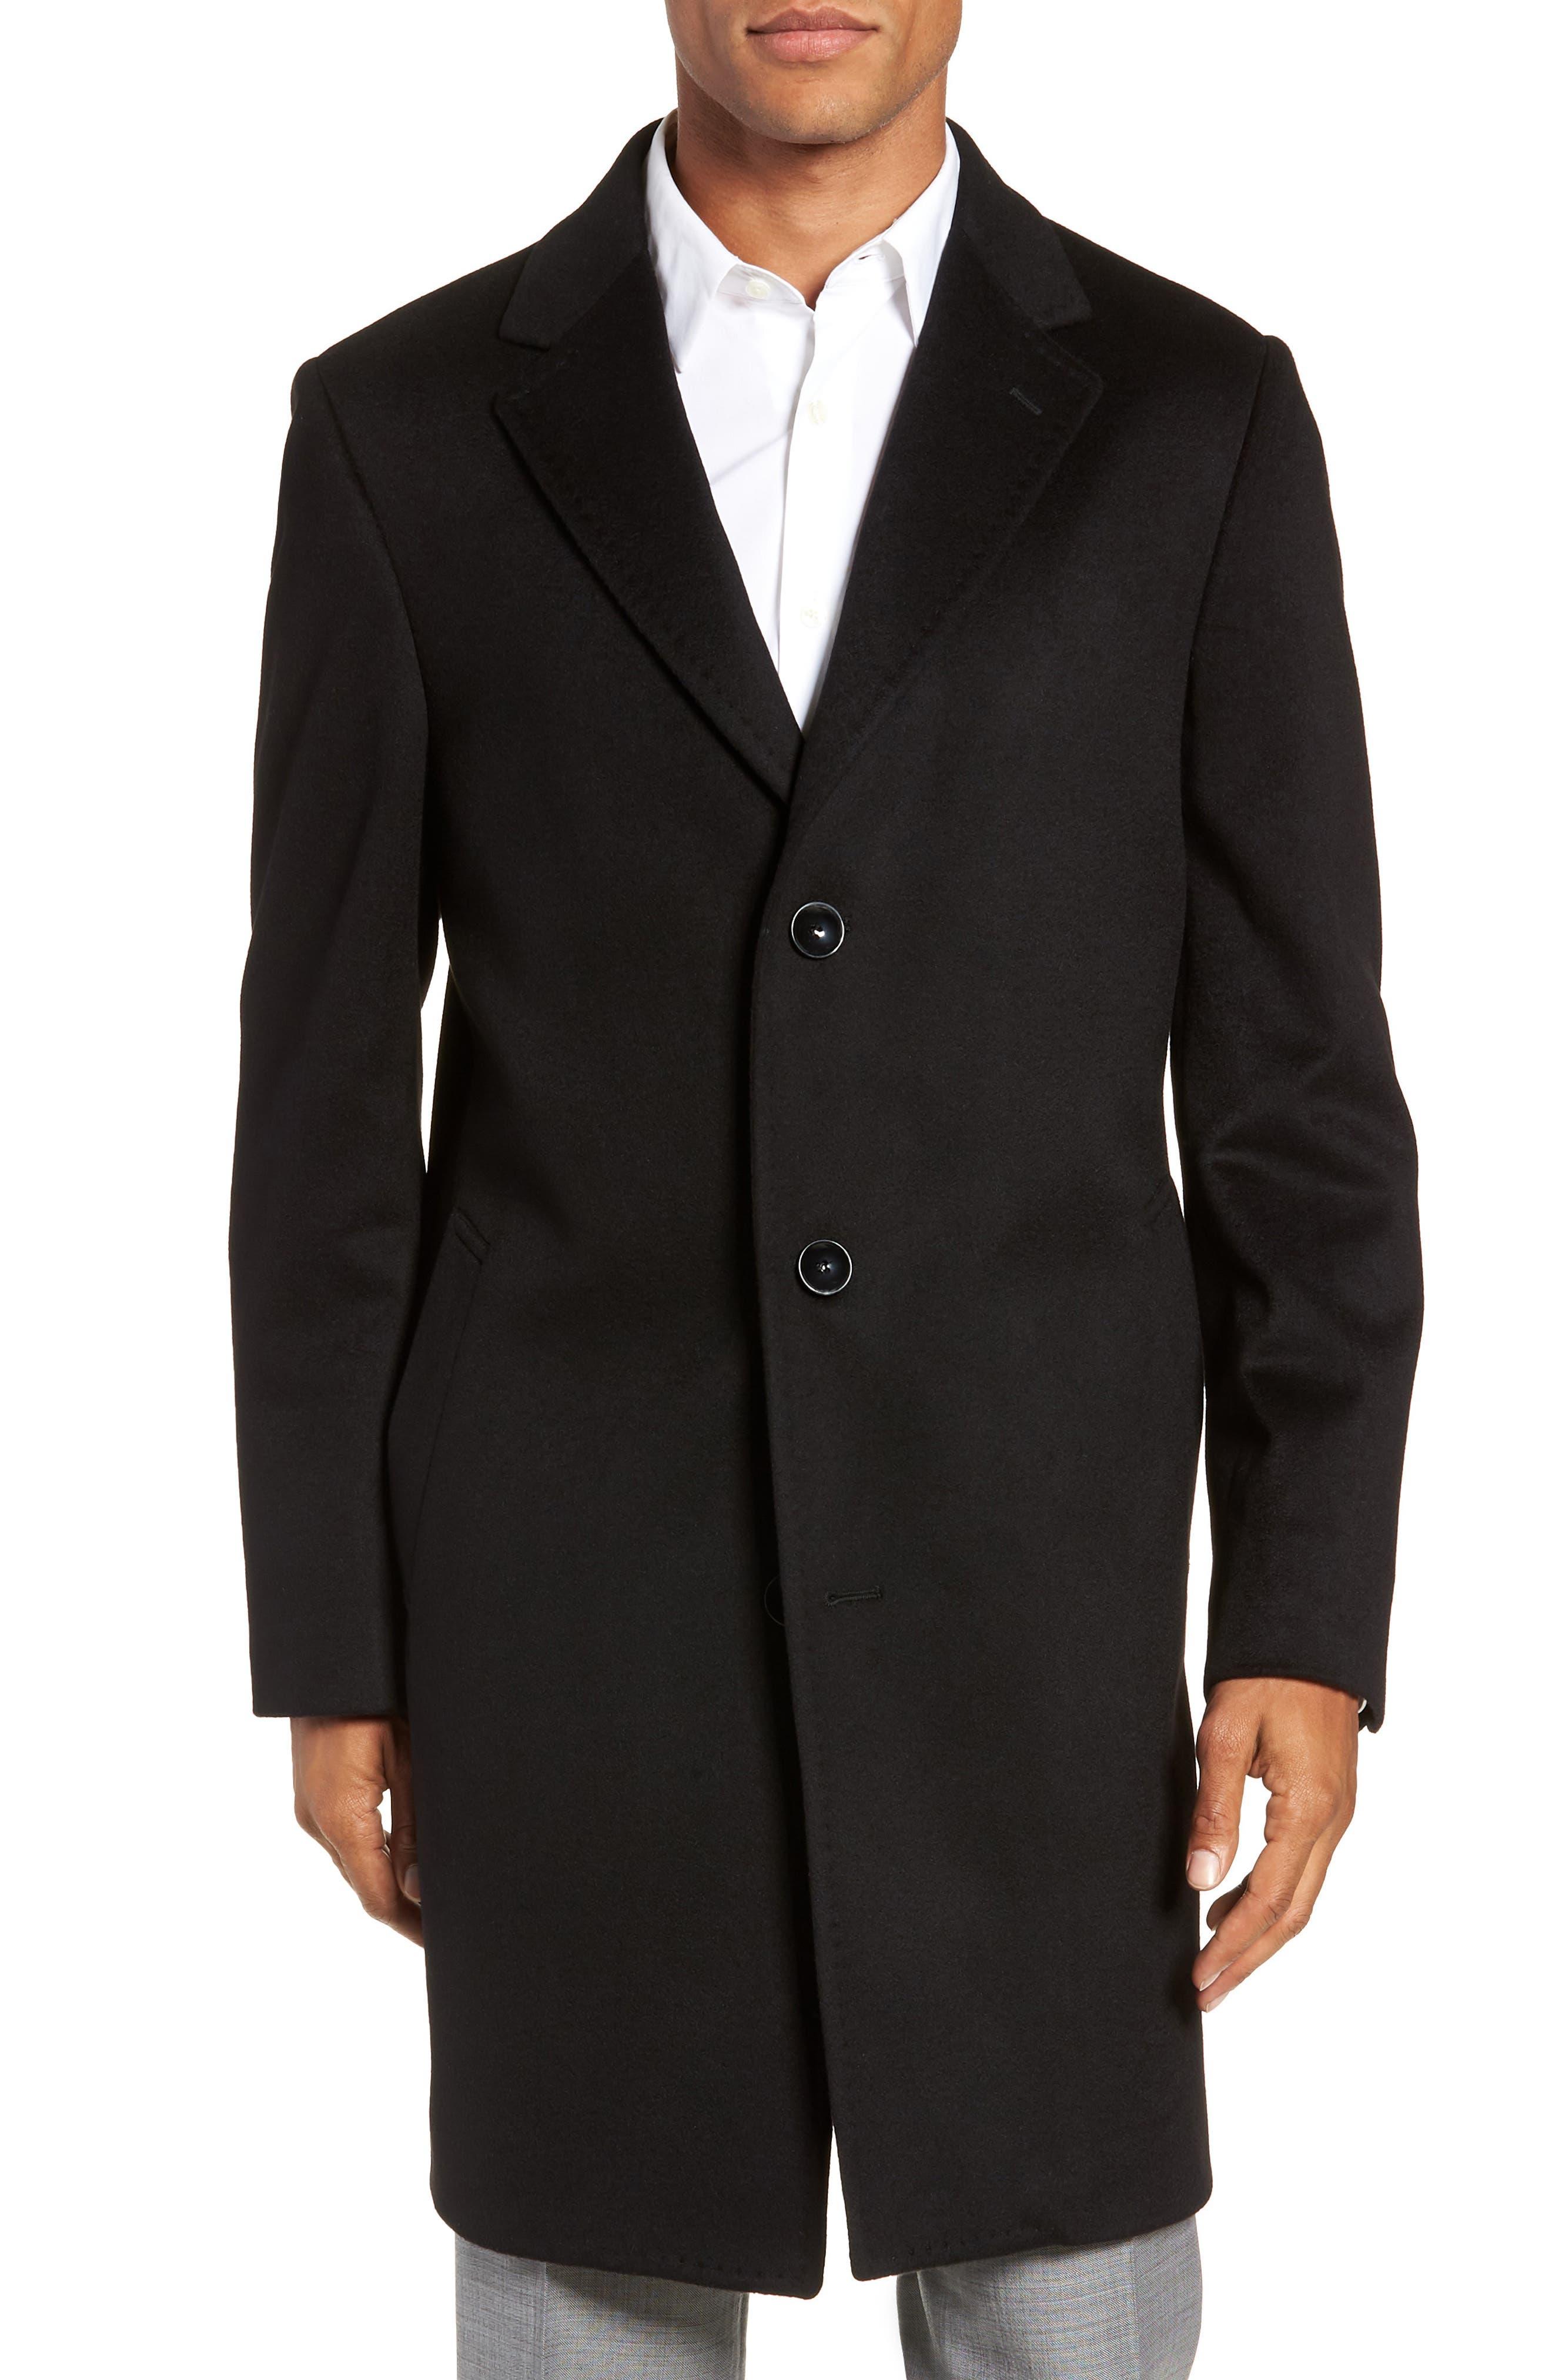 Darien Solid Cashmere Overcoat,                             Main thumbnail 1, color,                             BLACK